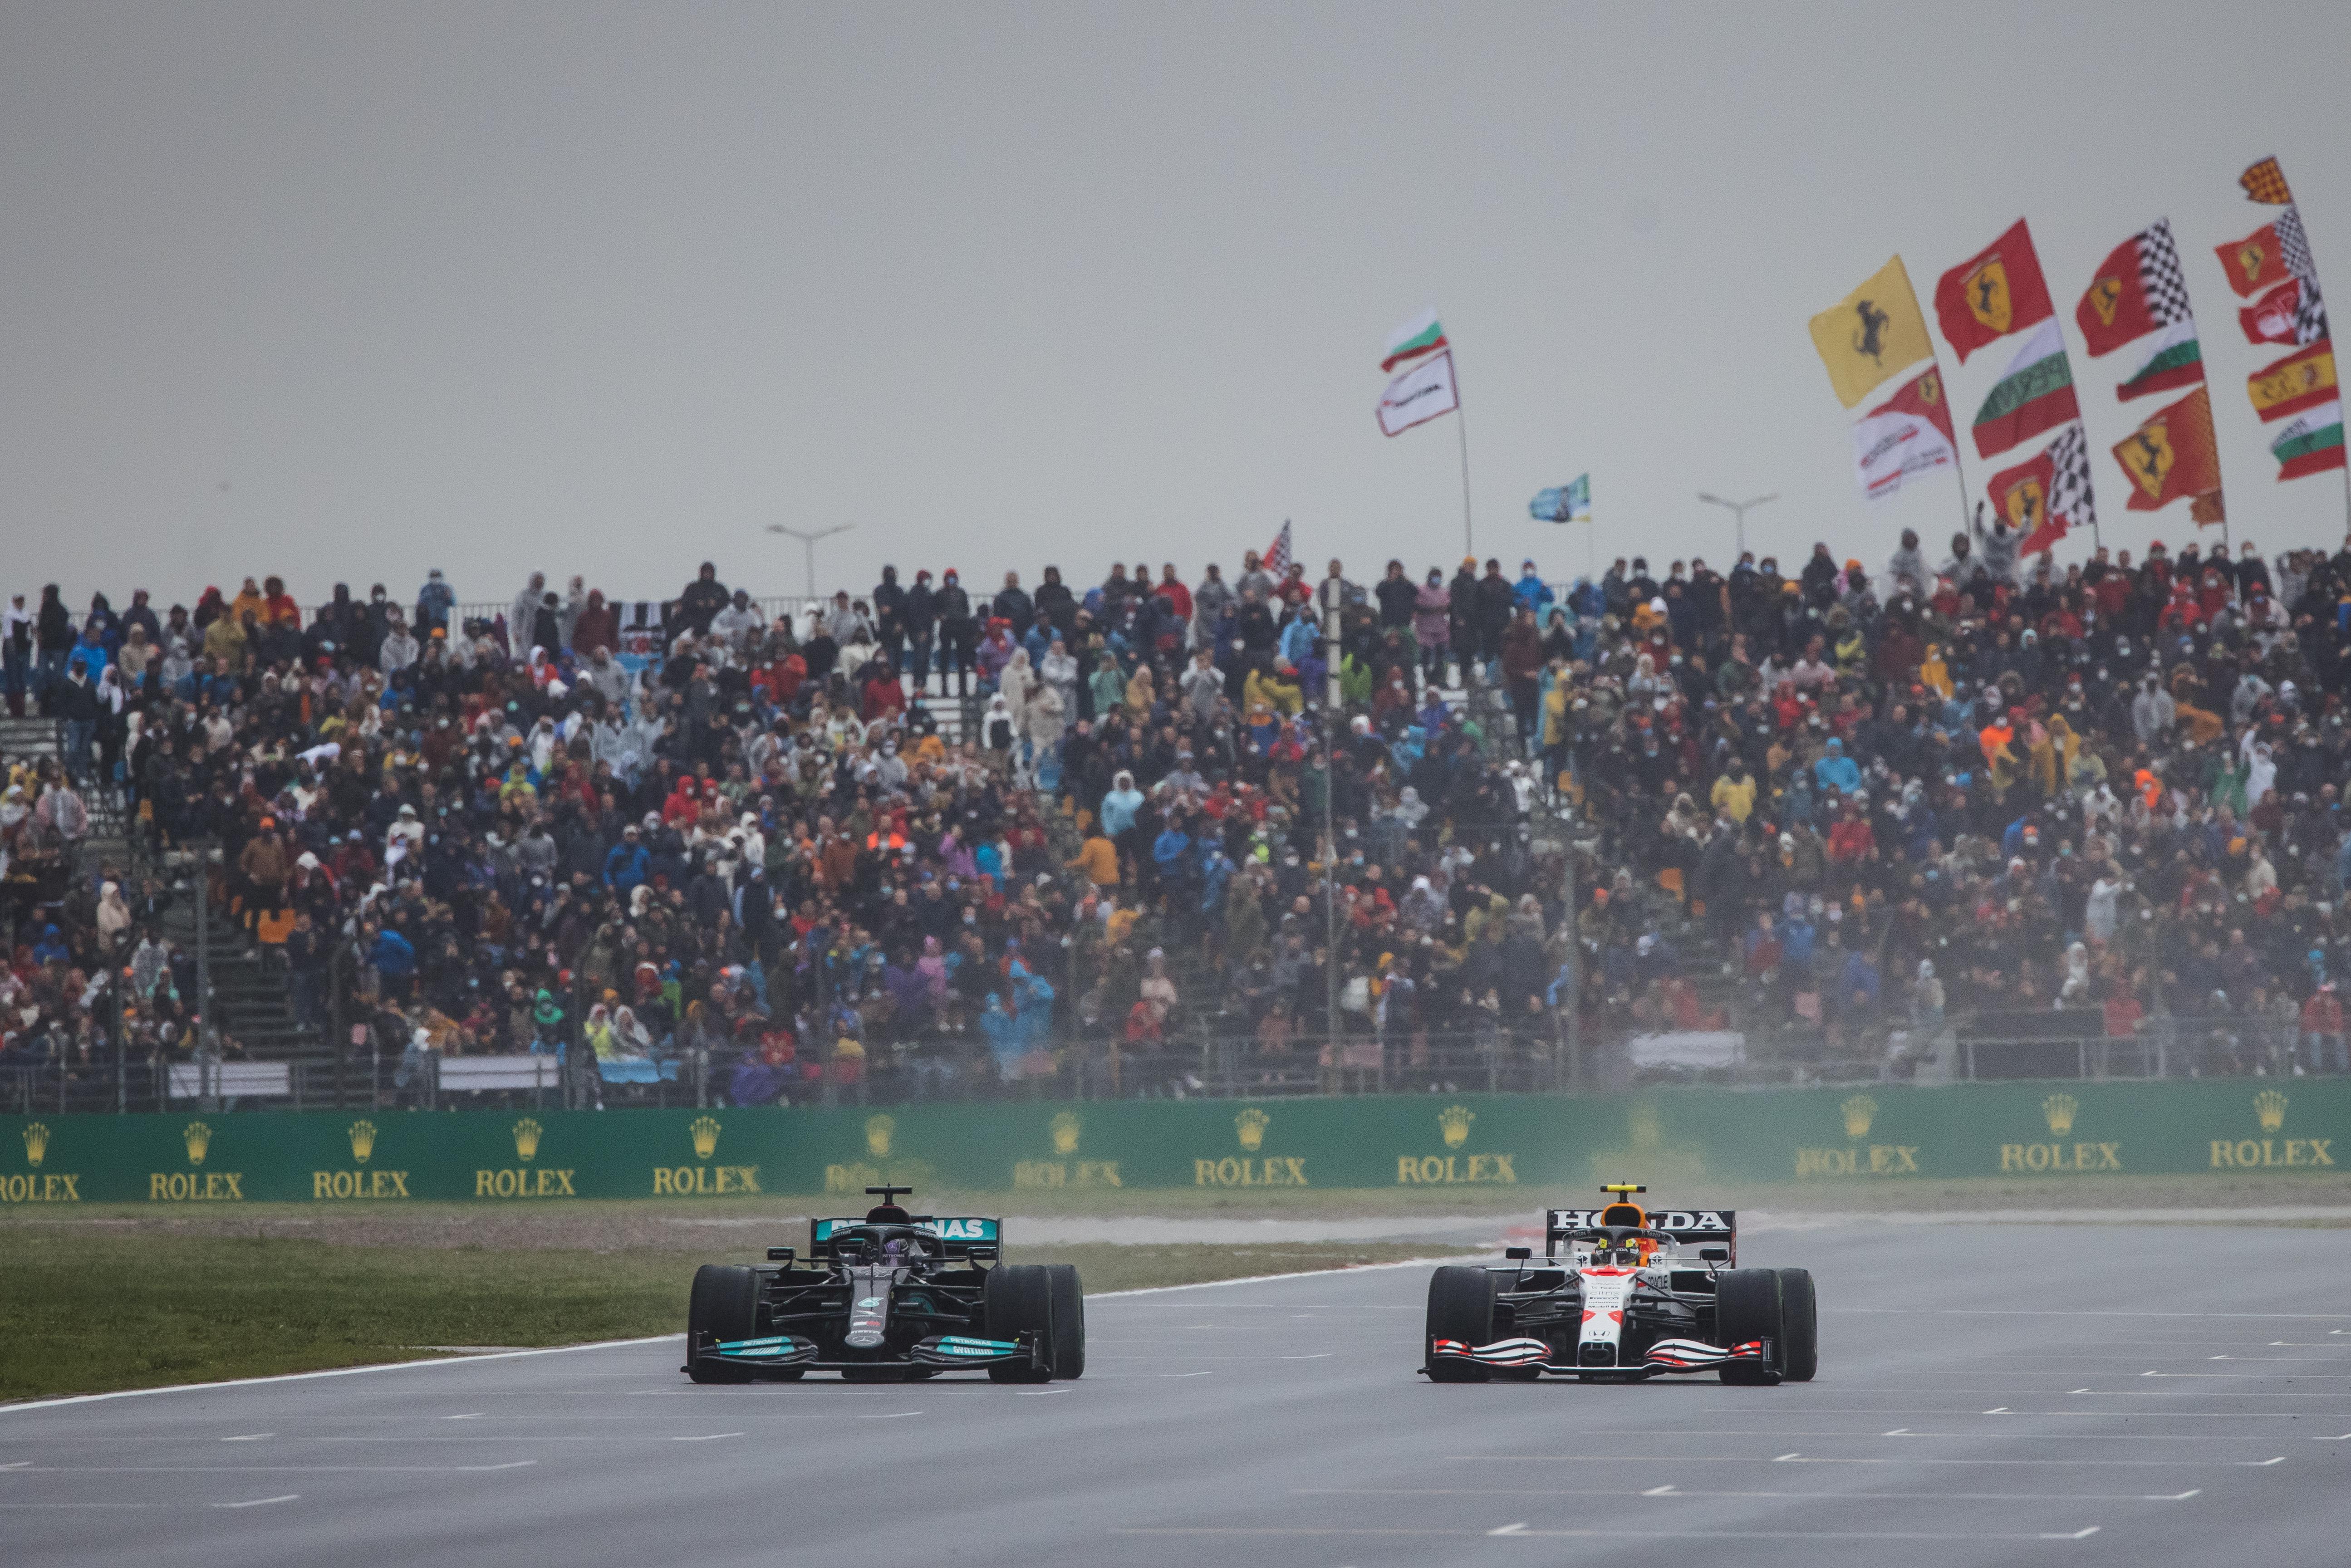 Motor Racing Formula One World Championship Turkish Grand Prix Race Day Istanbul, Turkey